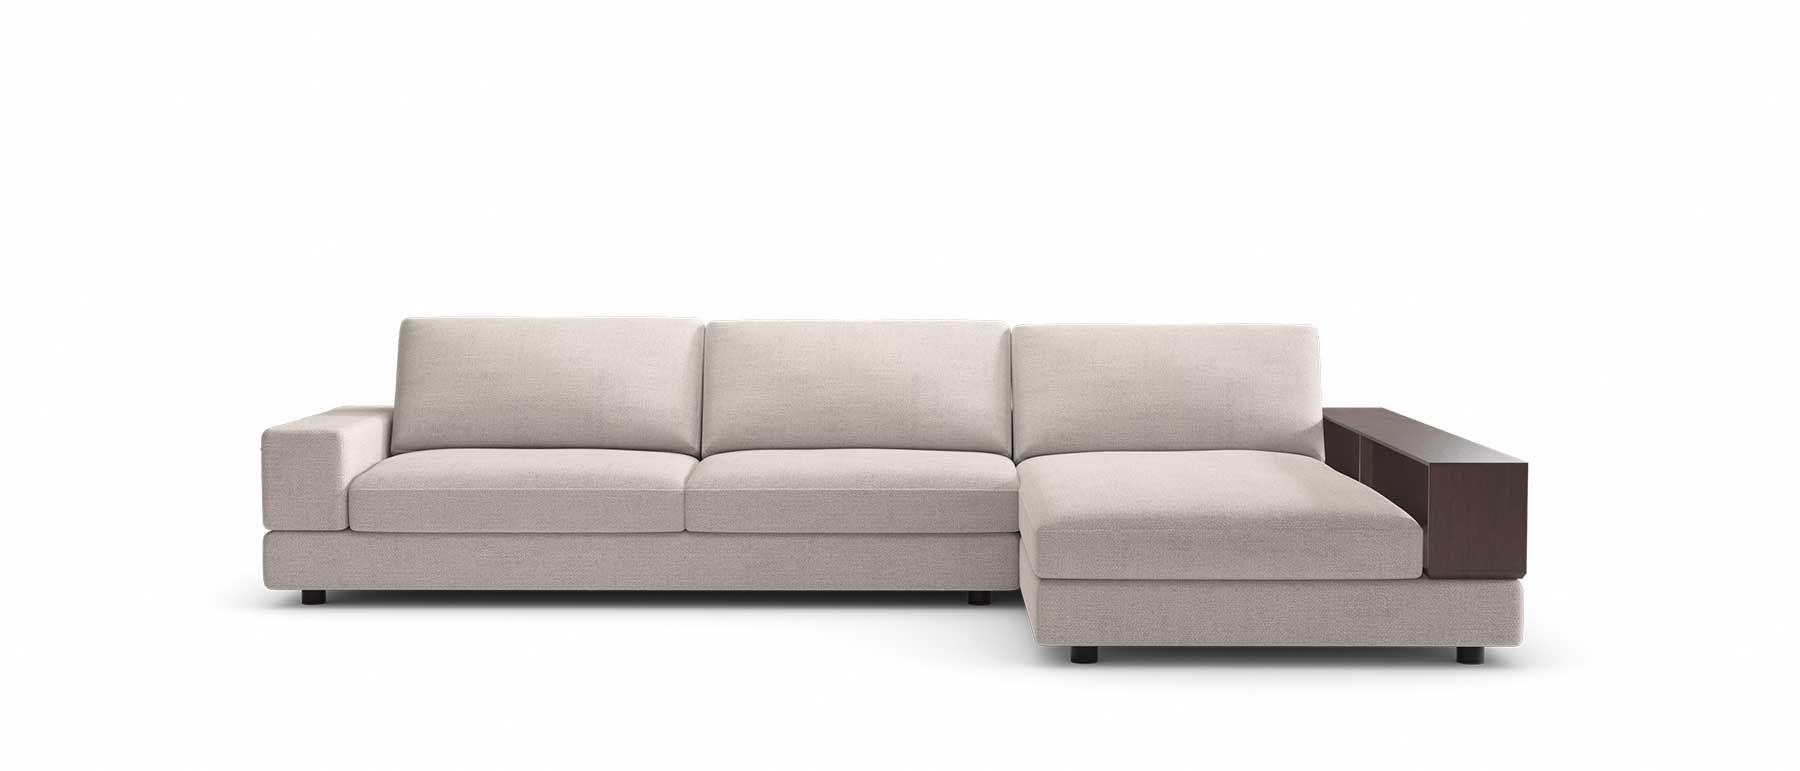 Jasper Modular Sofa Award Winning Design Modular Lounge Couch King Living Modular Sofa L Shaped Couch Couch